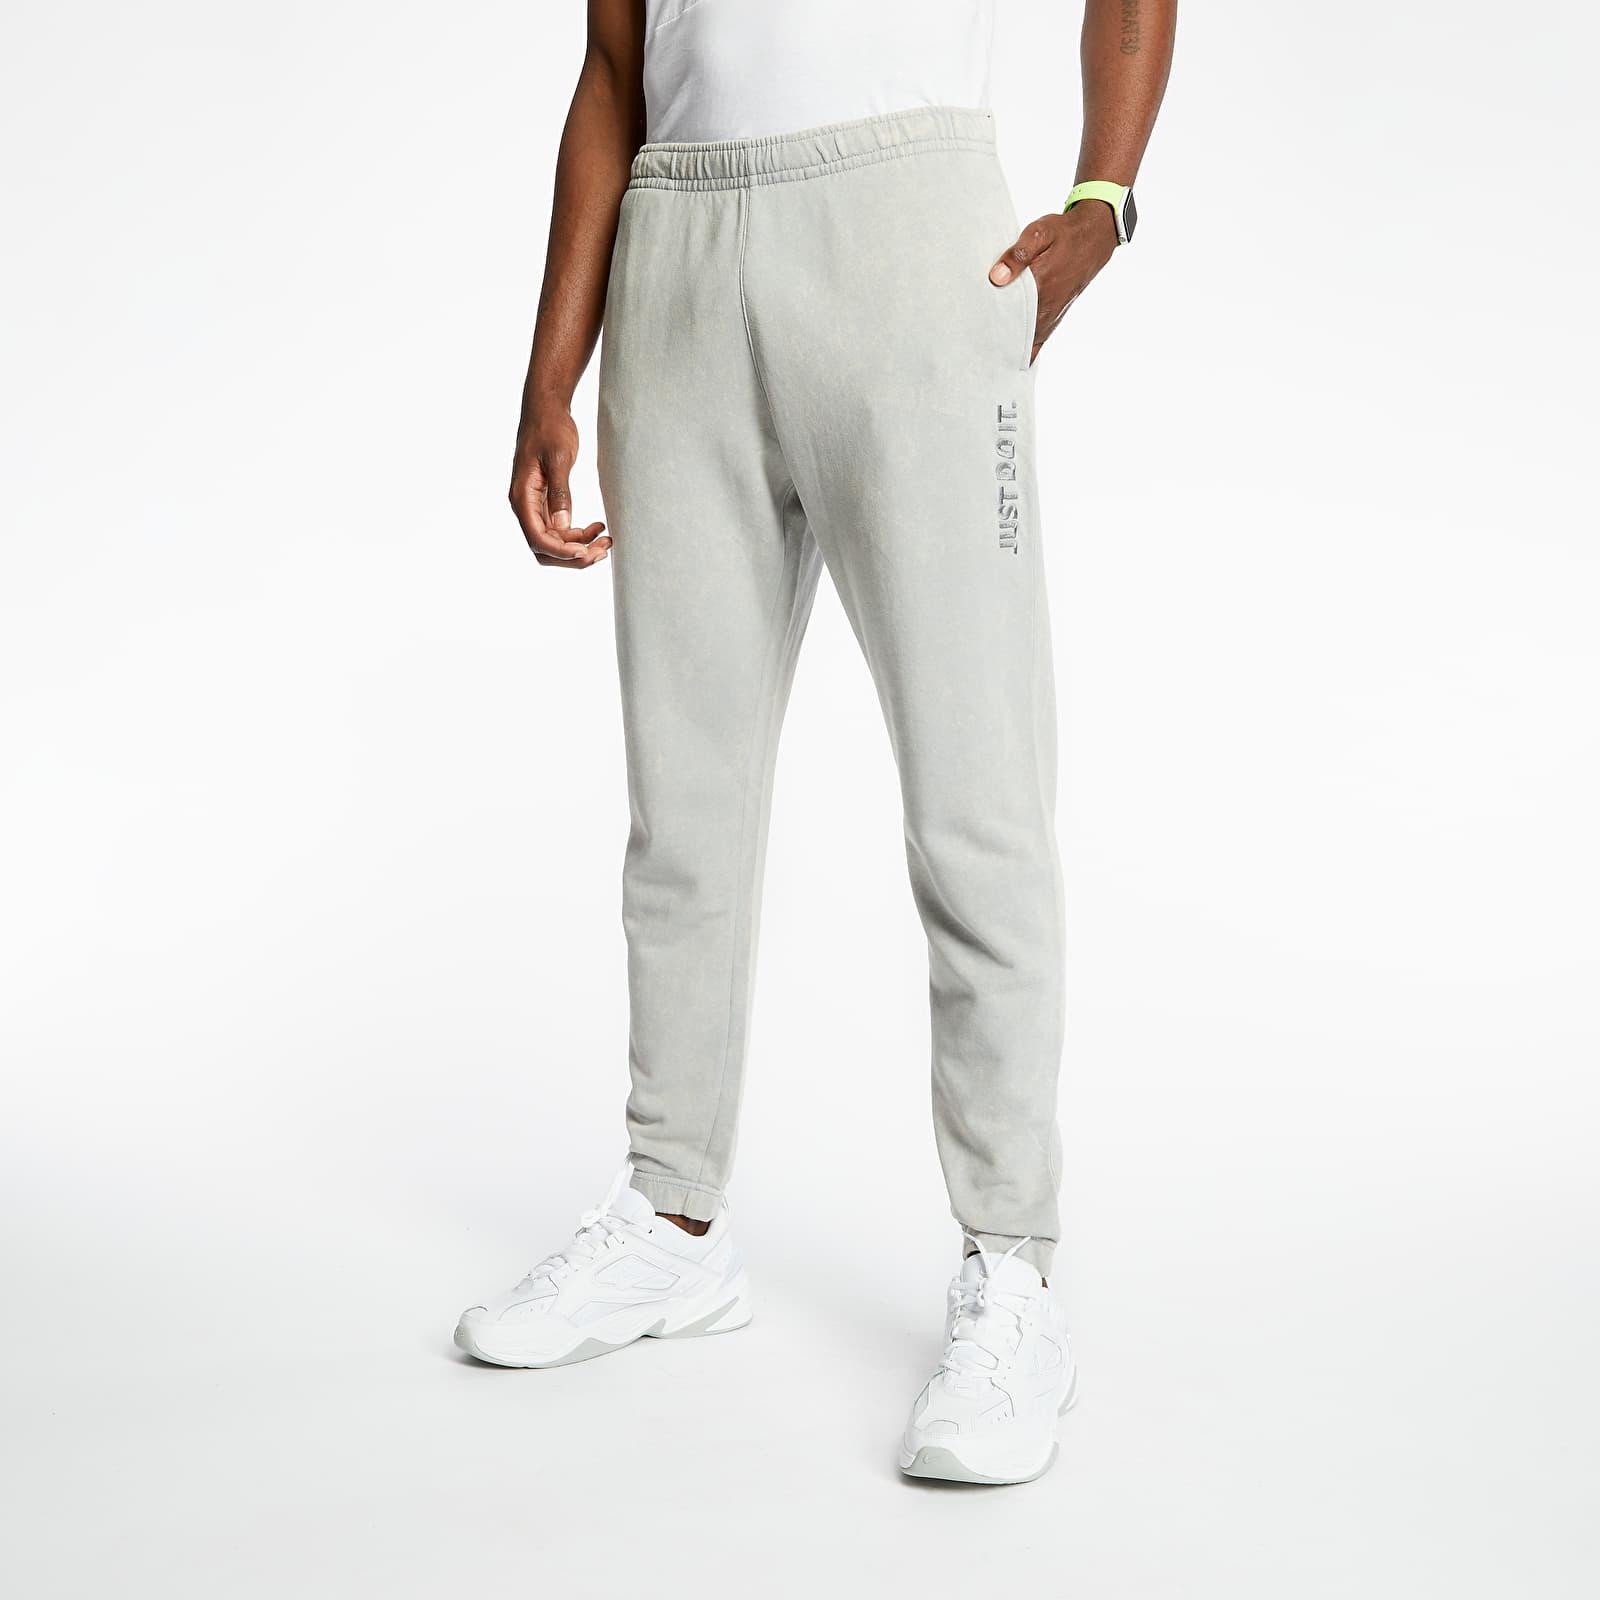 Pants and jeans Nike Sportswear Just Do It Wash Pants Lt Smoke Grey/ Lt Smoke Grey